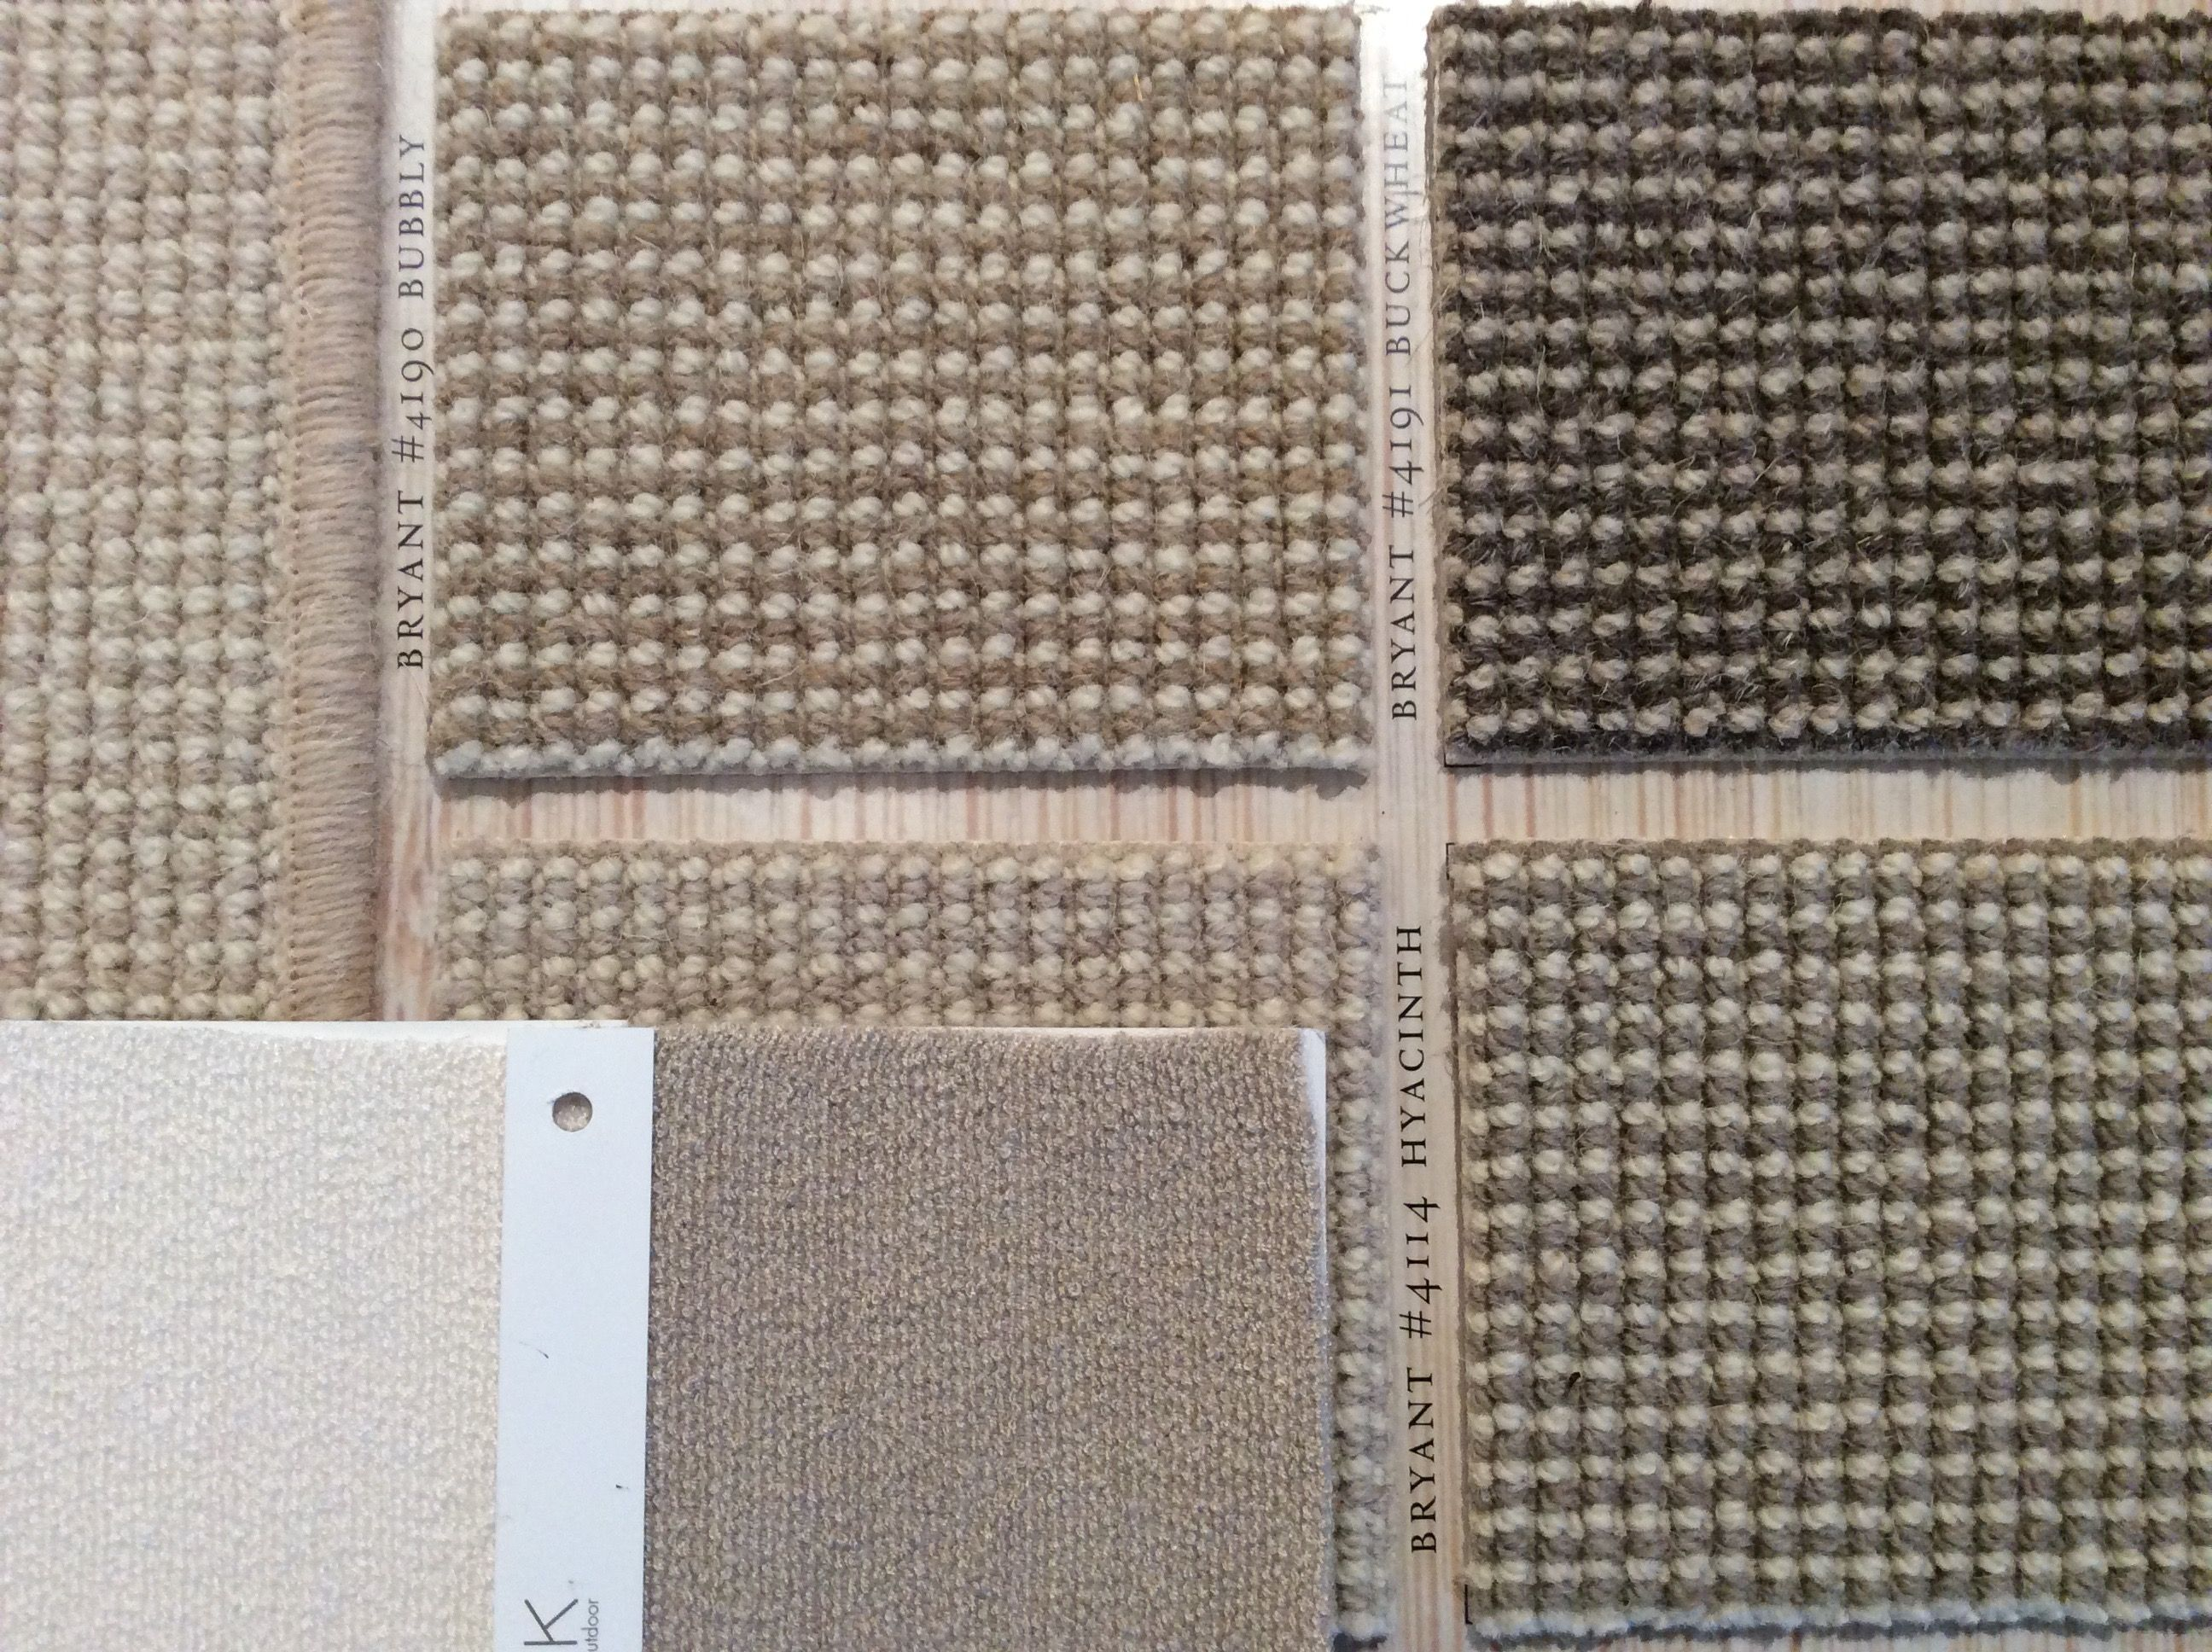 herringbone icedteafairy cleaning beige mat sisal wool ideas beautiful club excellent mats carpet